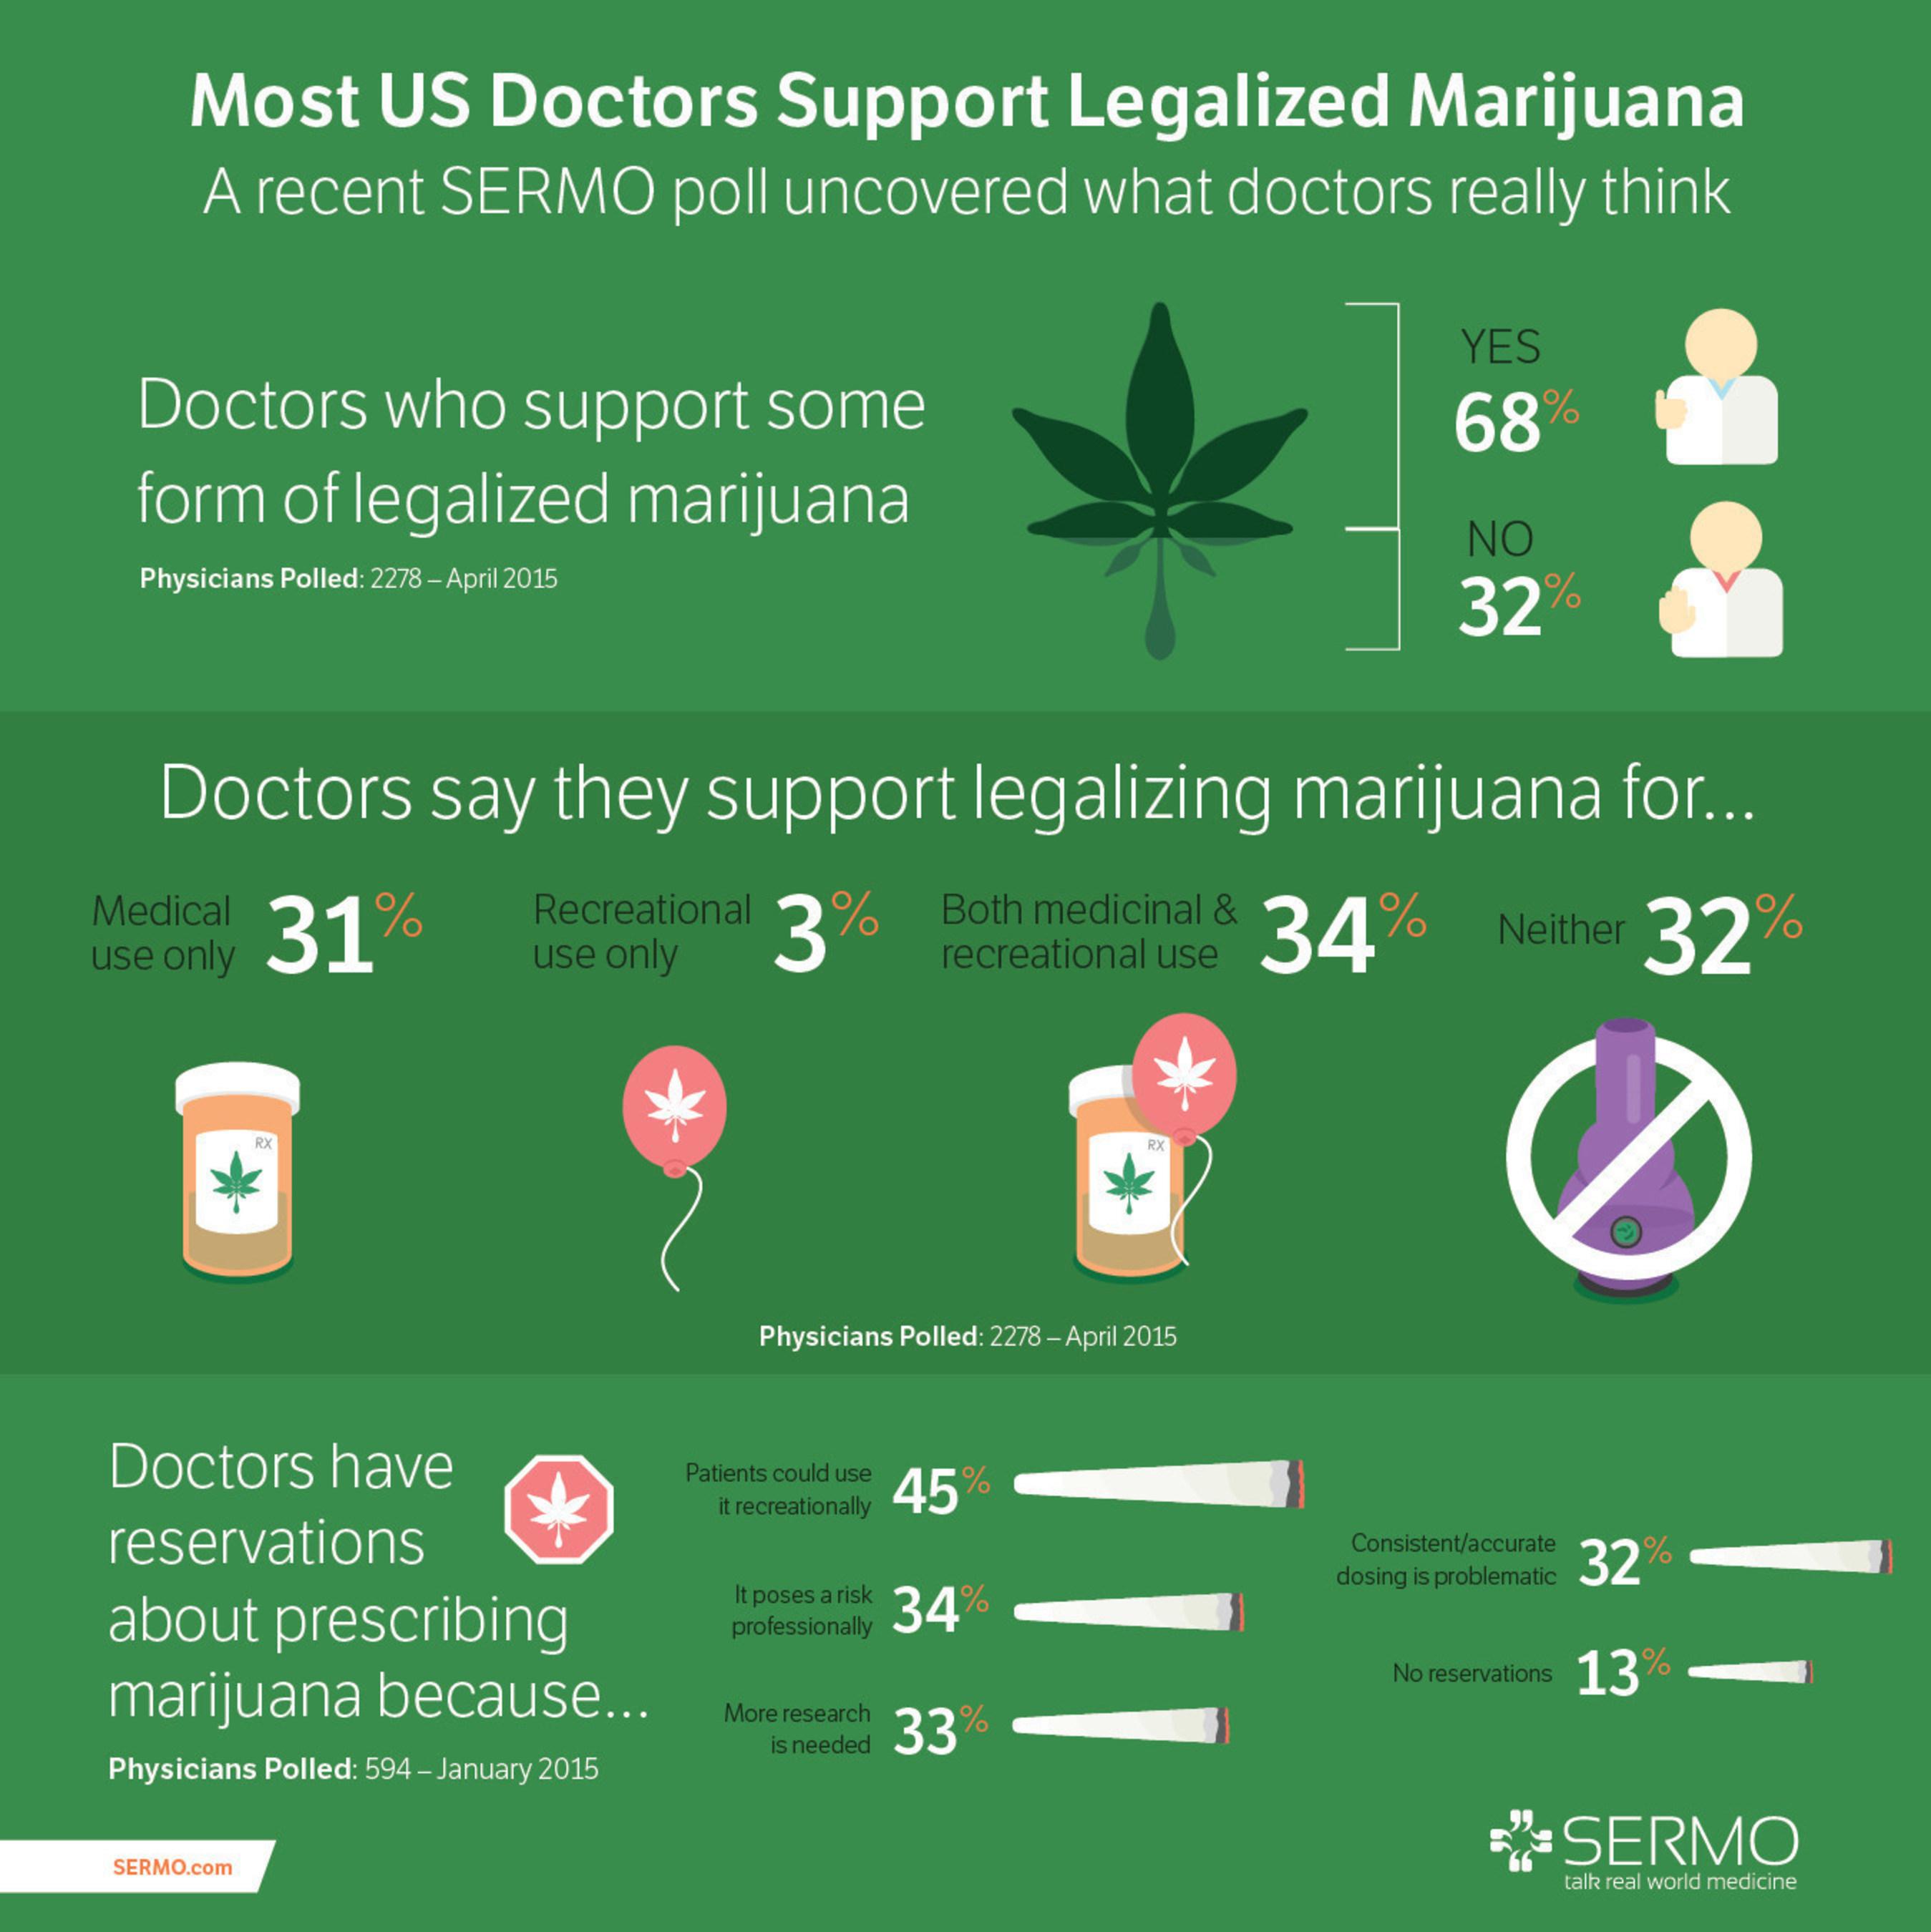 SERMO Marijuana Poll Results from April 20, 2015